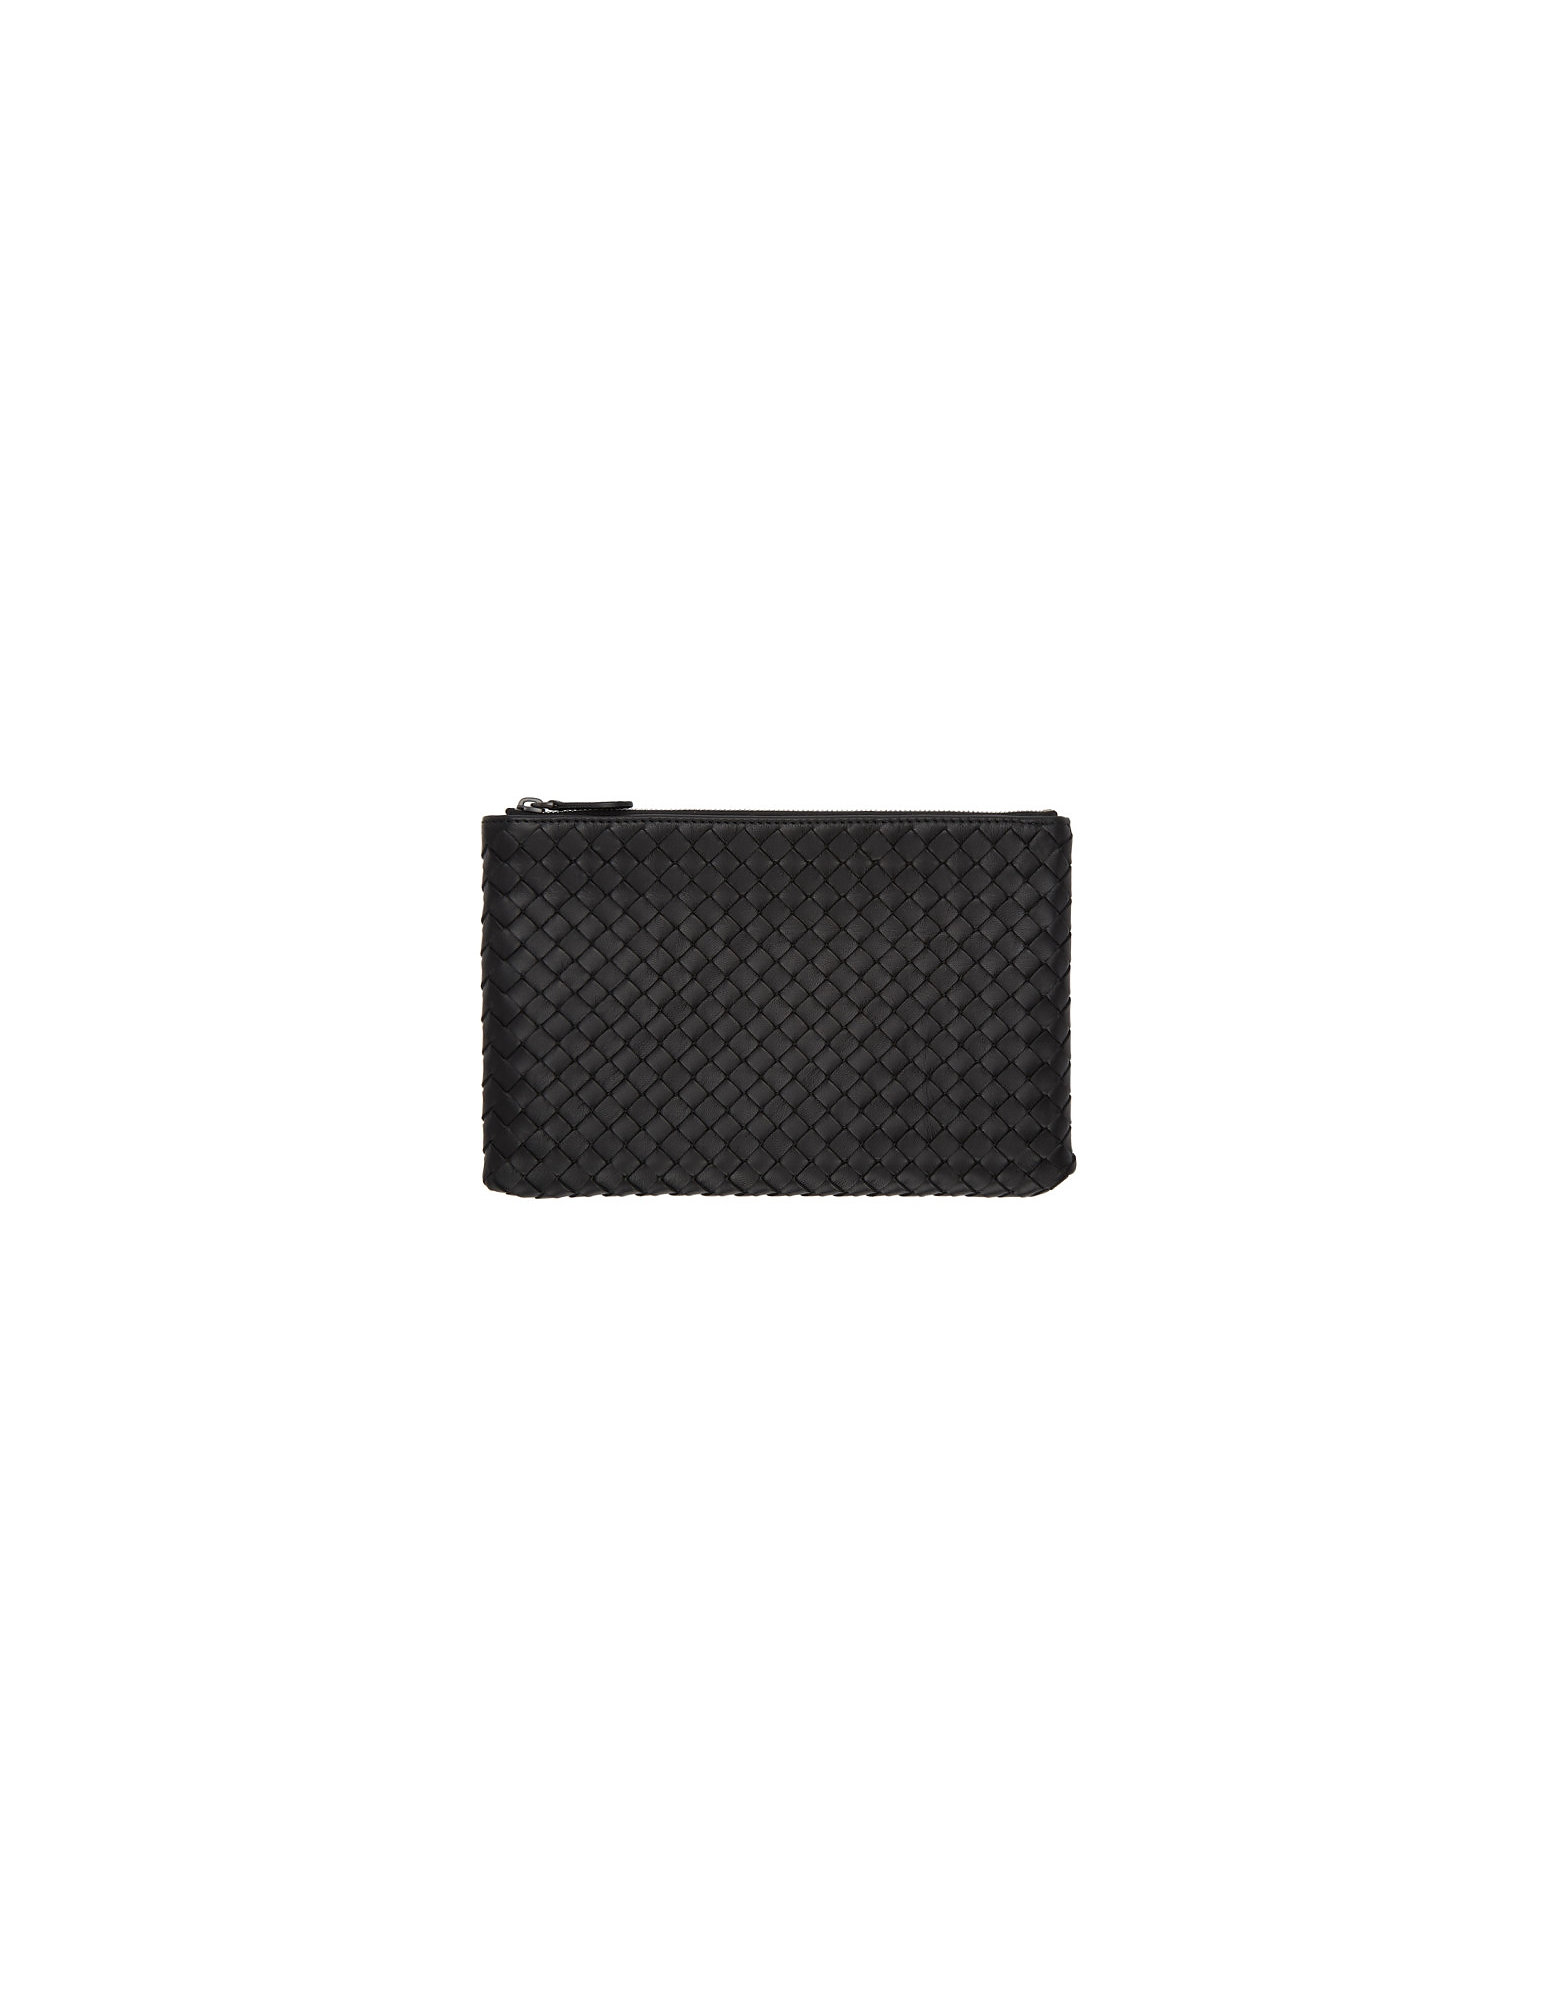 Bottega Veneta Designer Handbags, Black Intrecciato Biletto Pouch